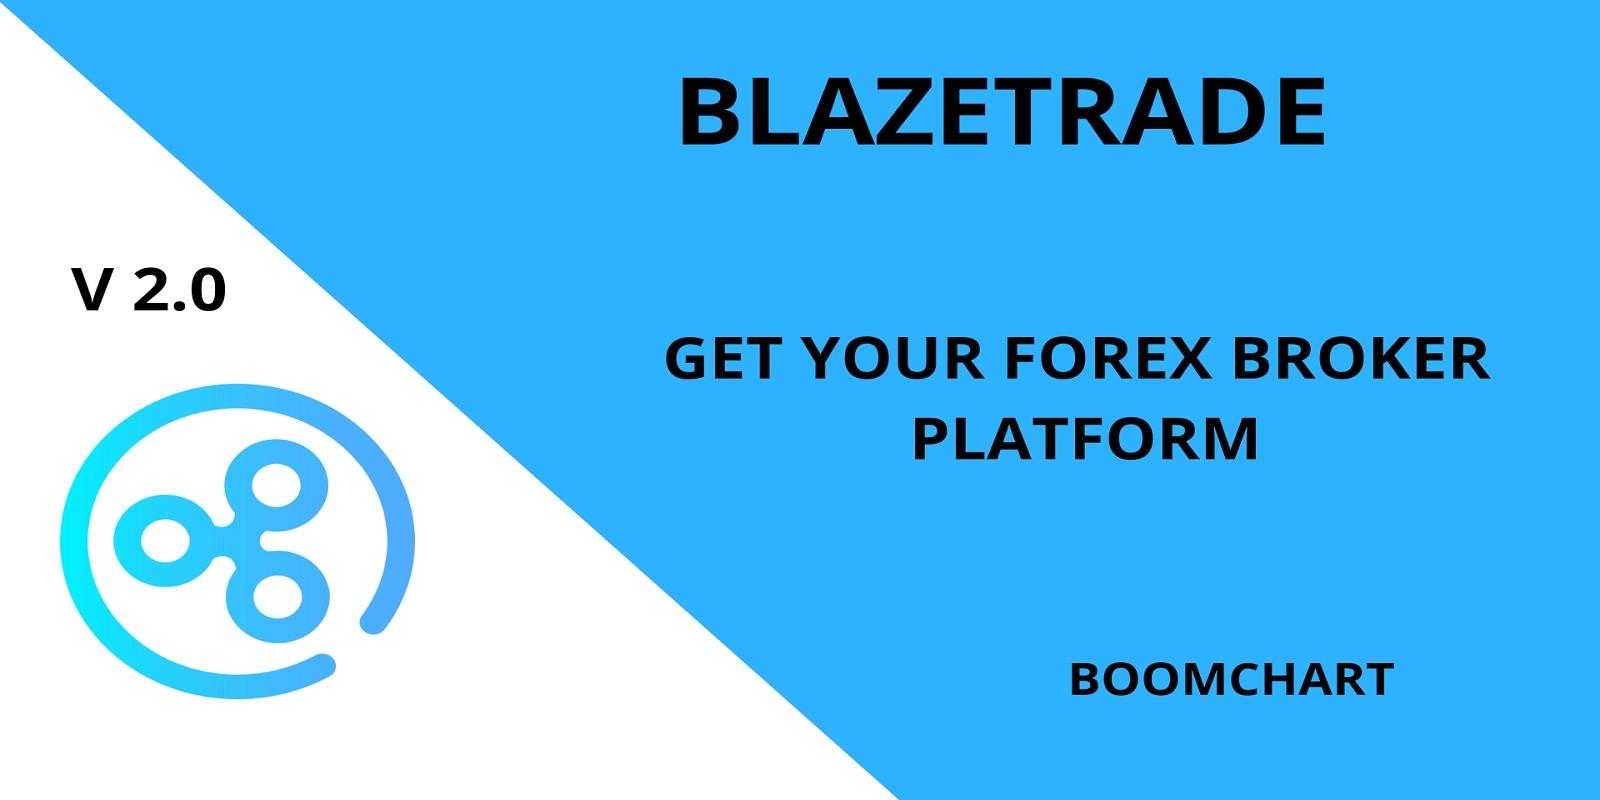 Blazetrade - Hyip Investment And Trading Script